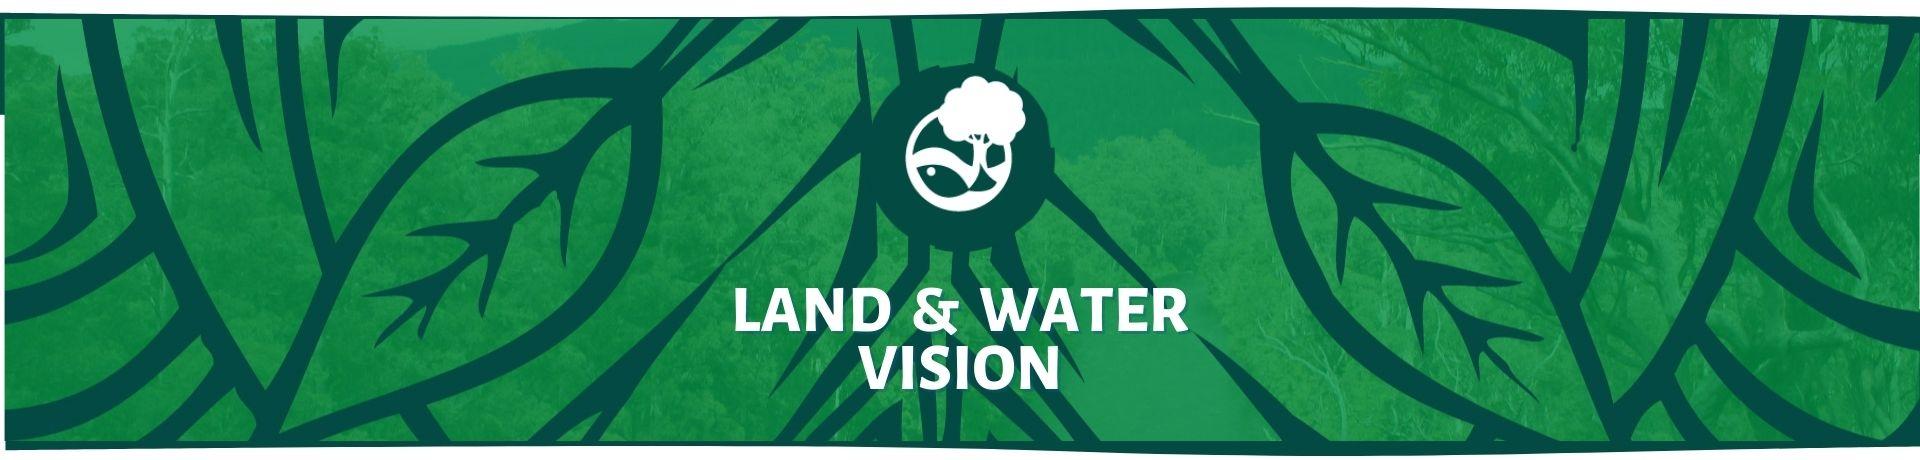 Land & Water Vision